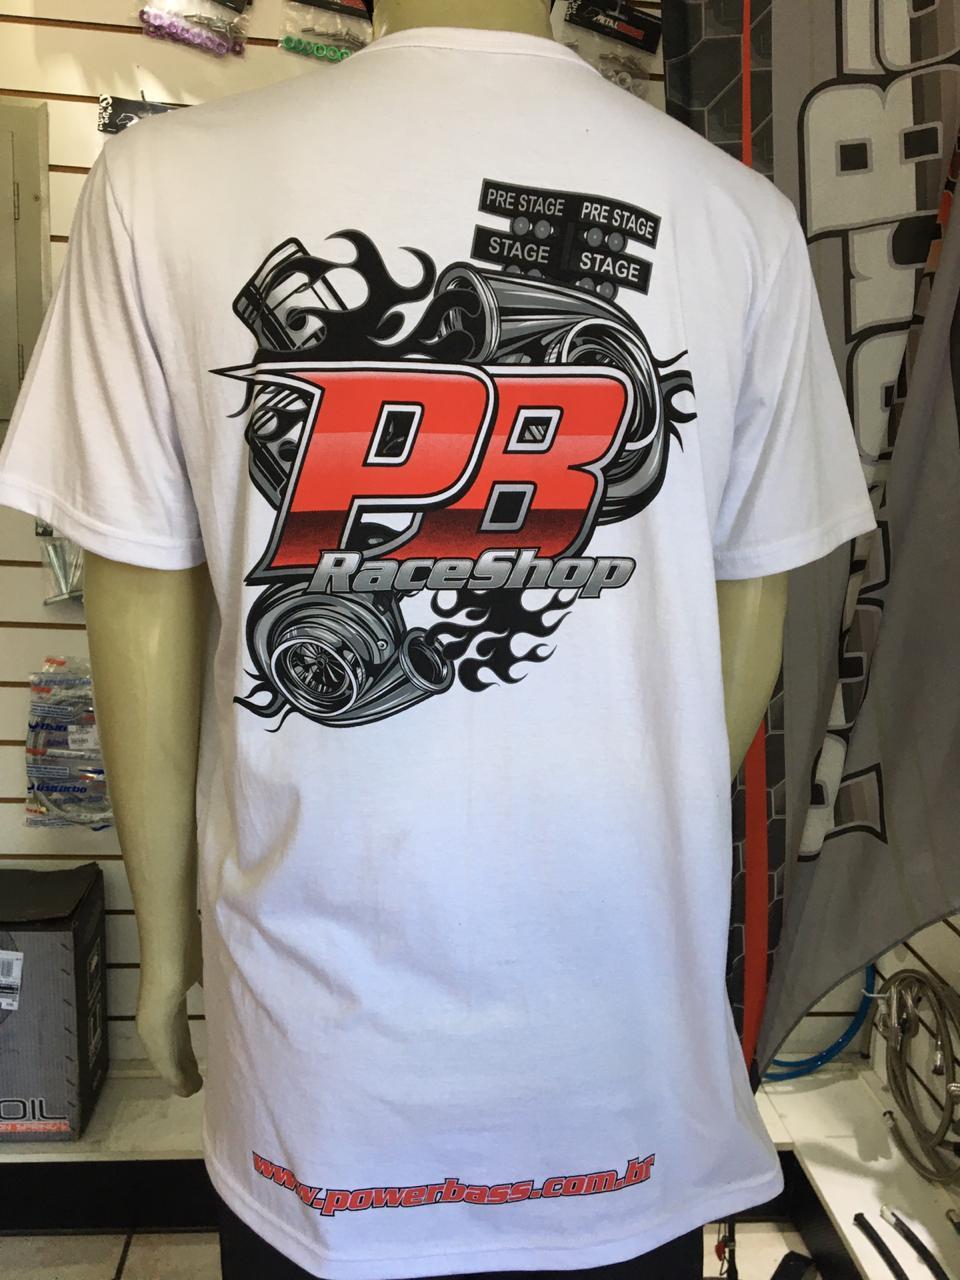 Camiseta PB- Power Bass Race Shop